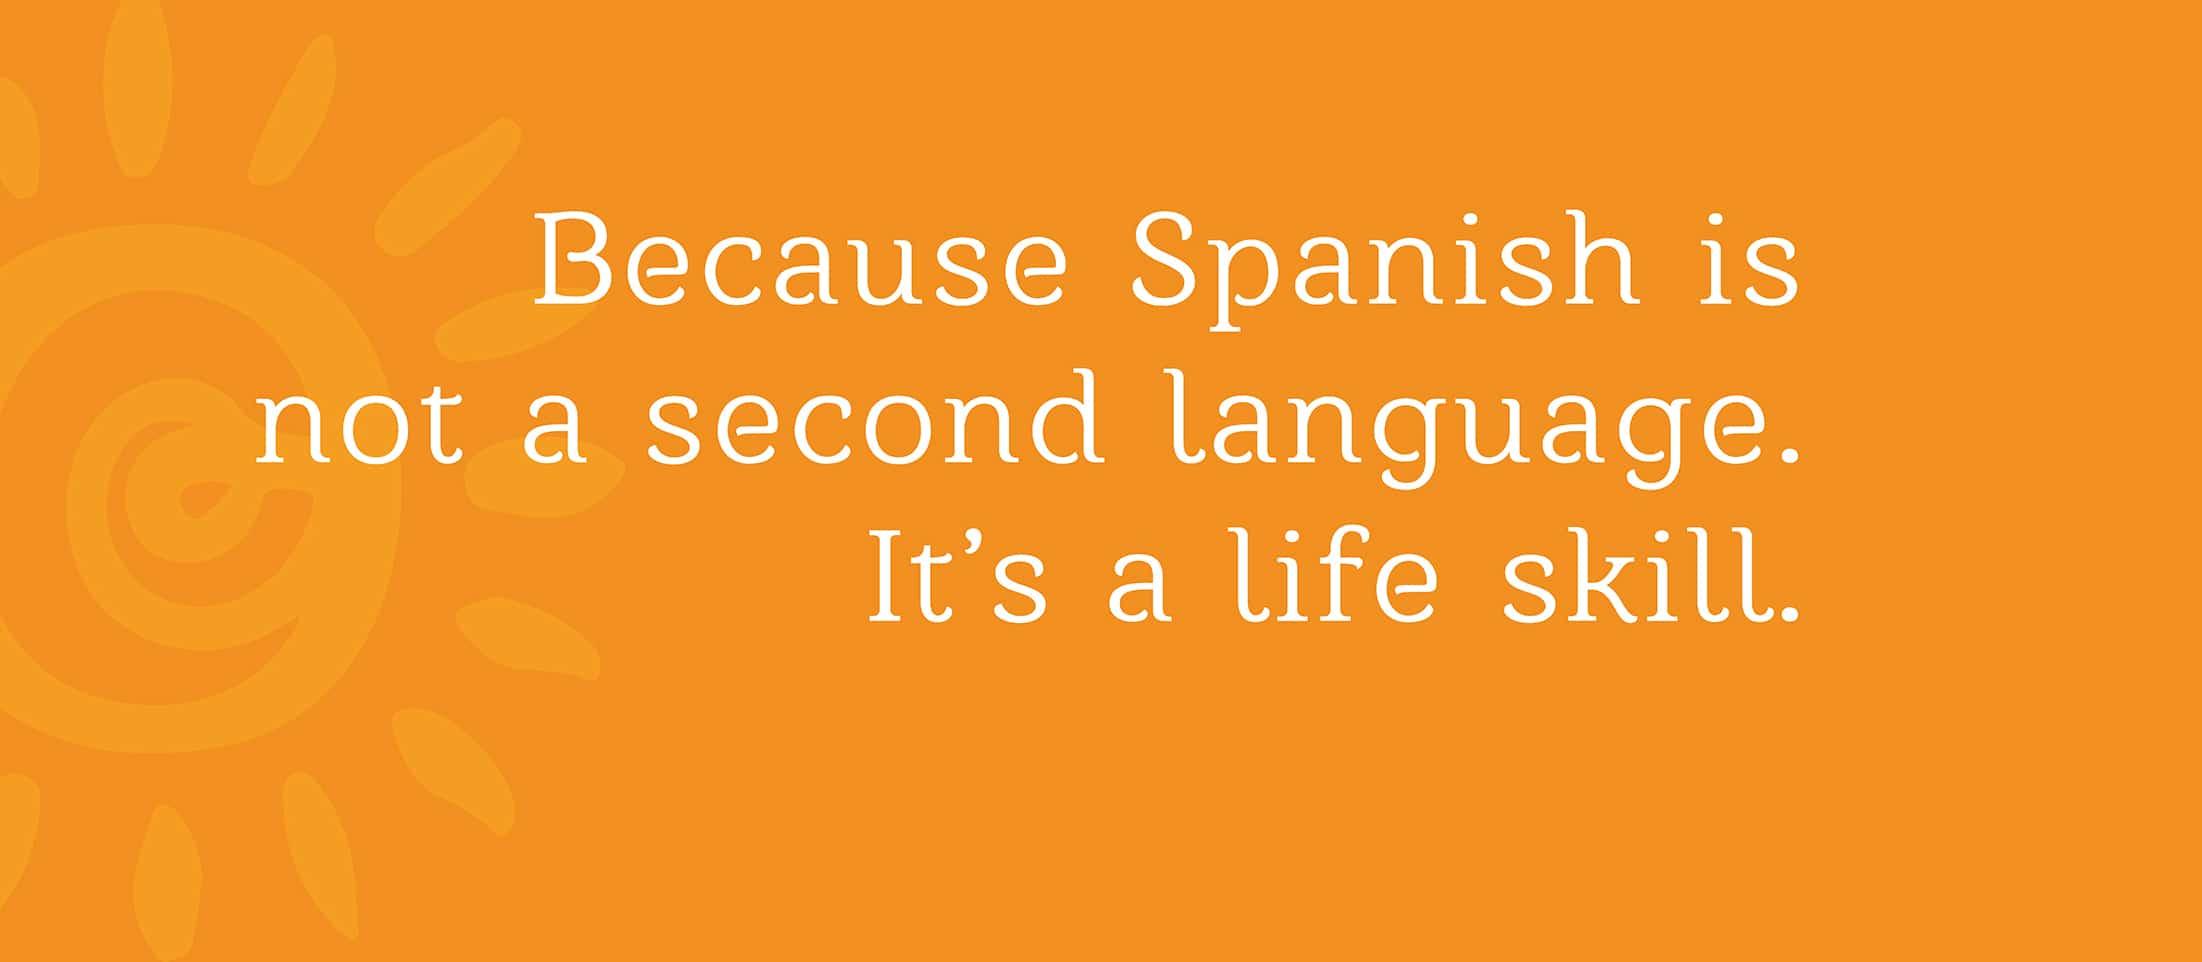 early spanish education preschool